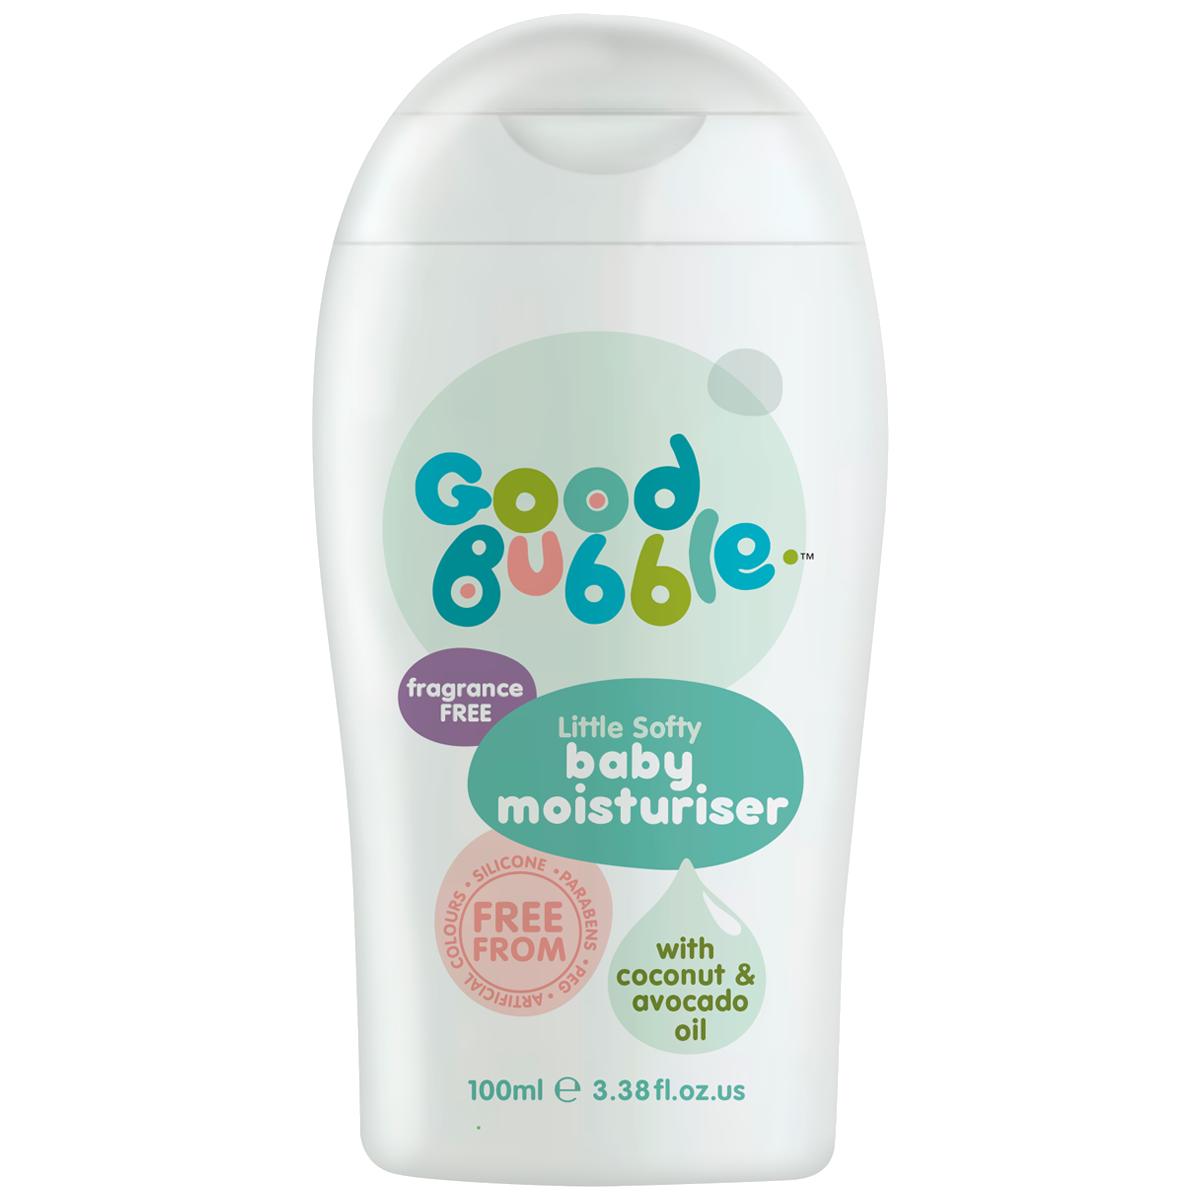 Shampoo clipart bubble bath bottle. Little softy fragrance free